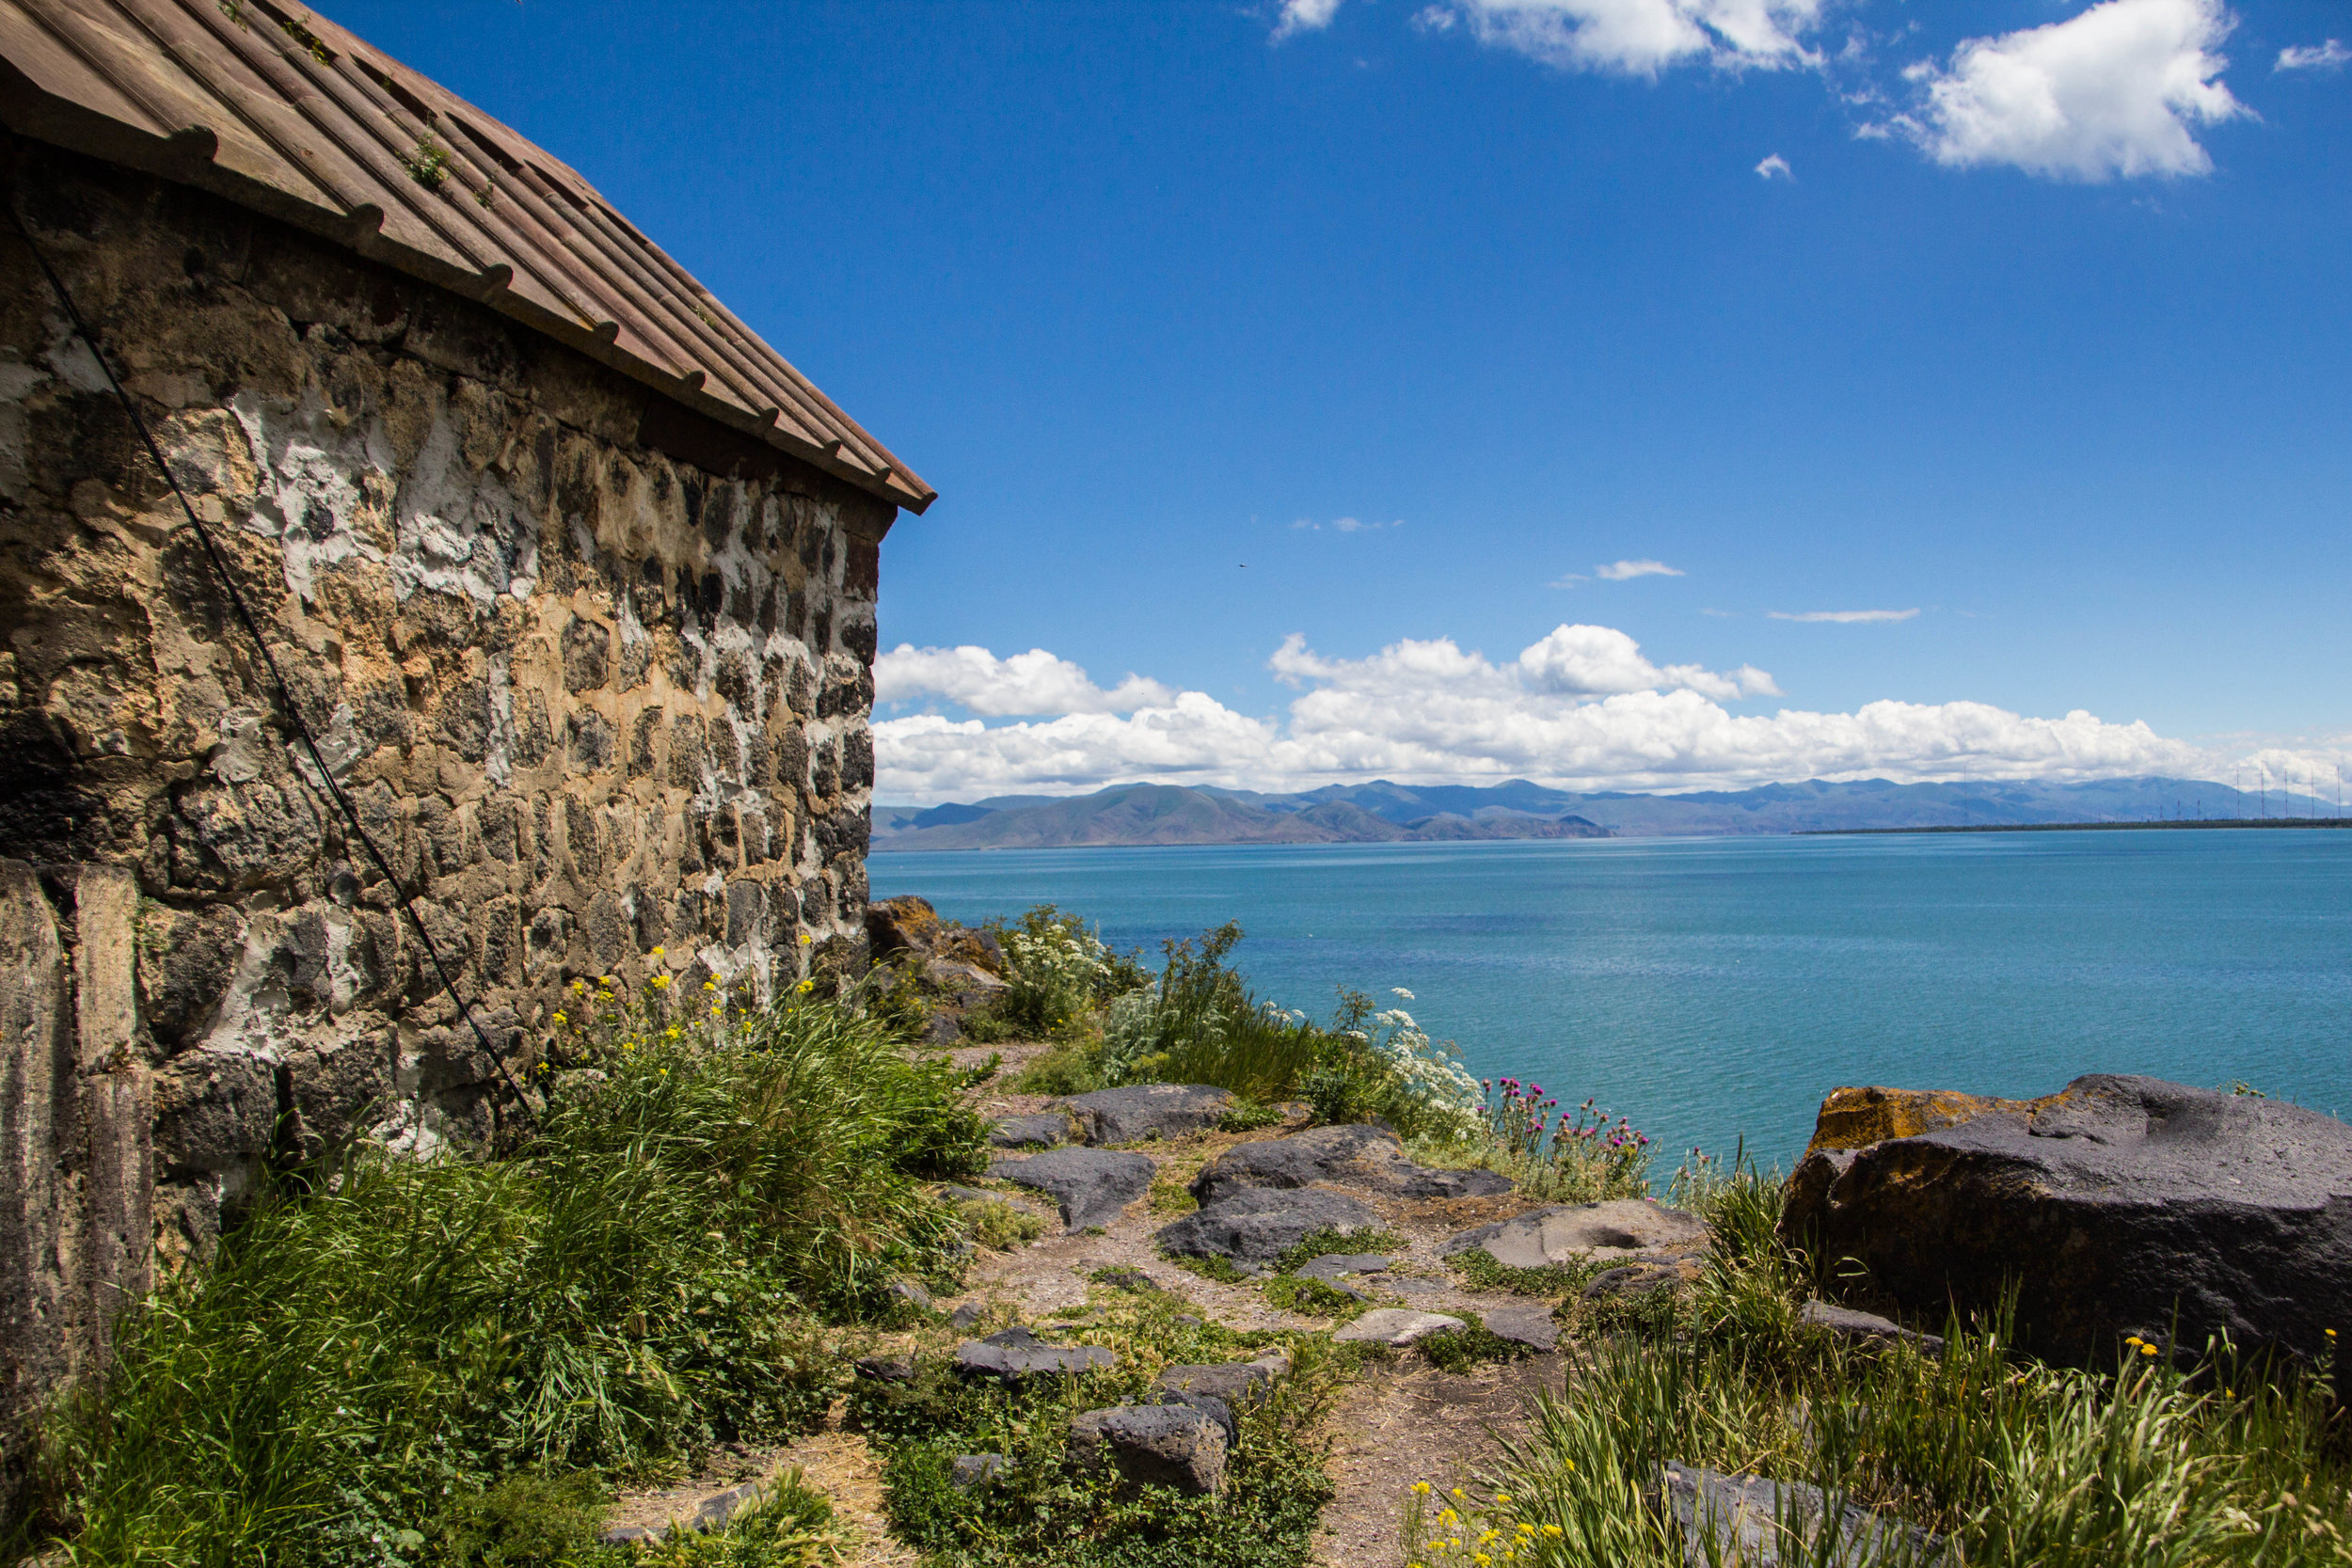 hayravank-lake-sevan-armenia-5.jpg